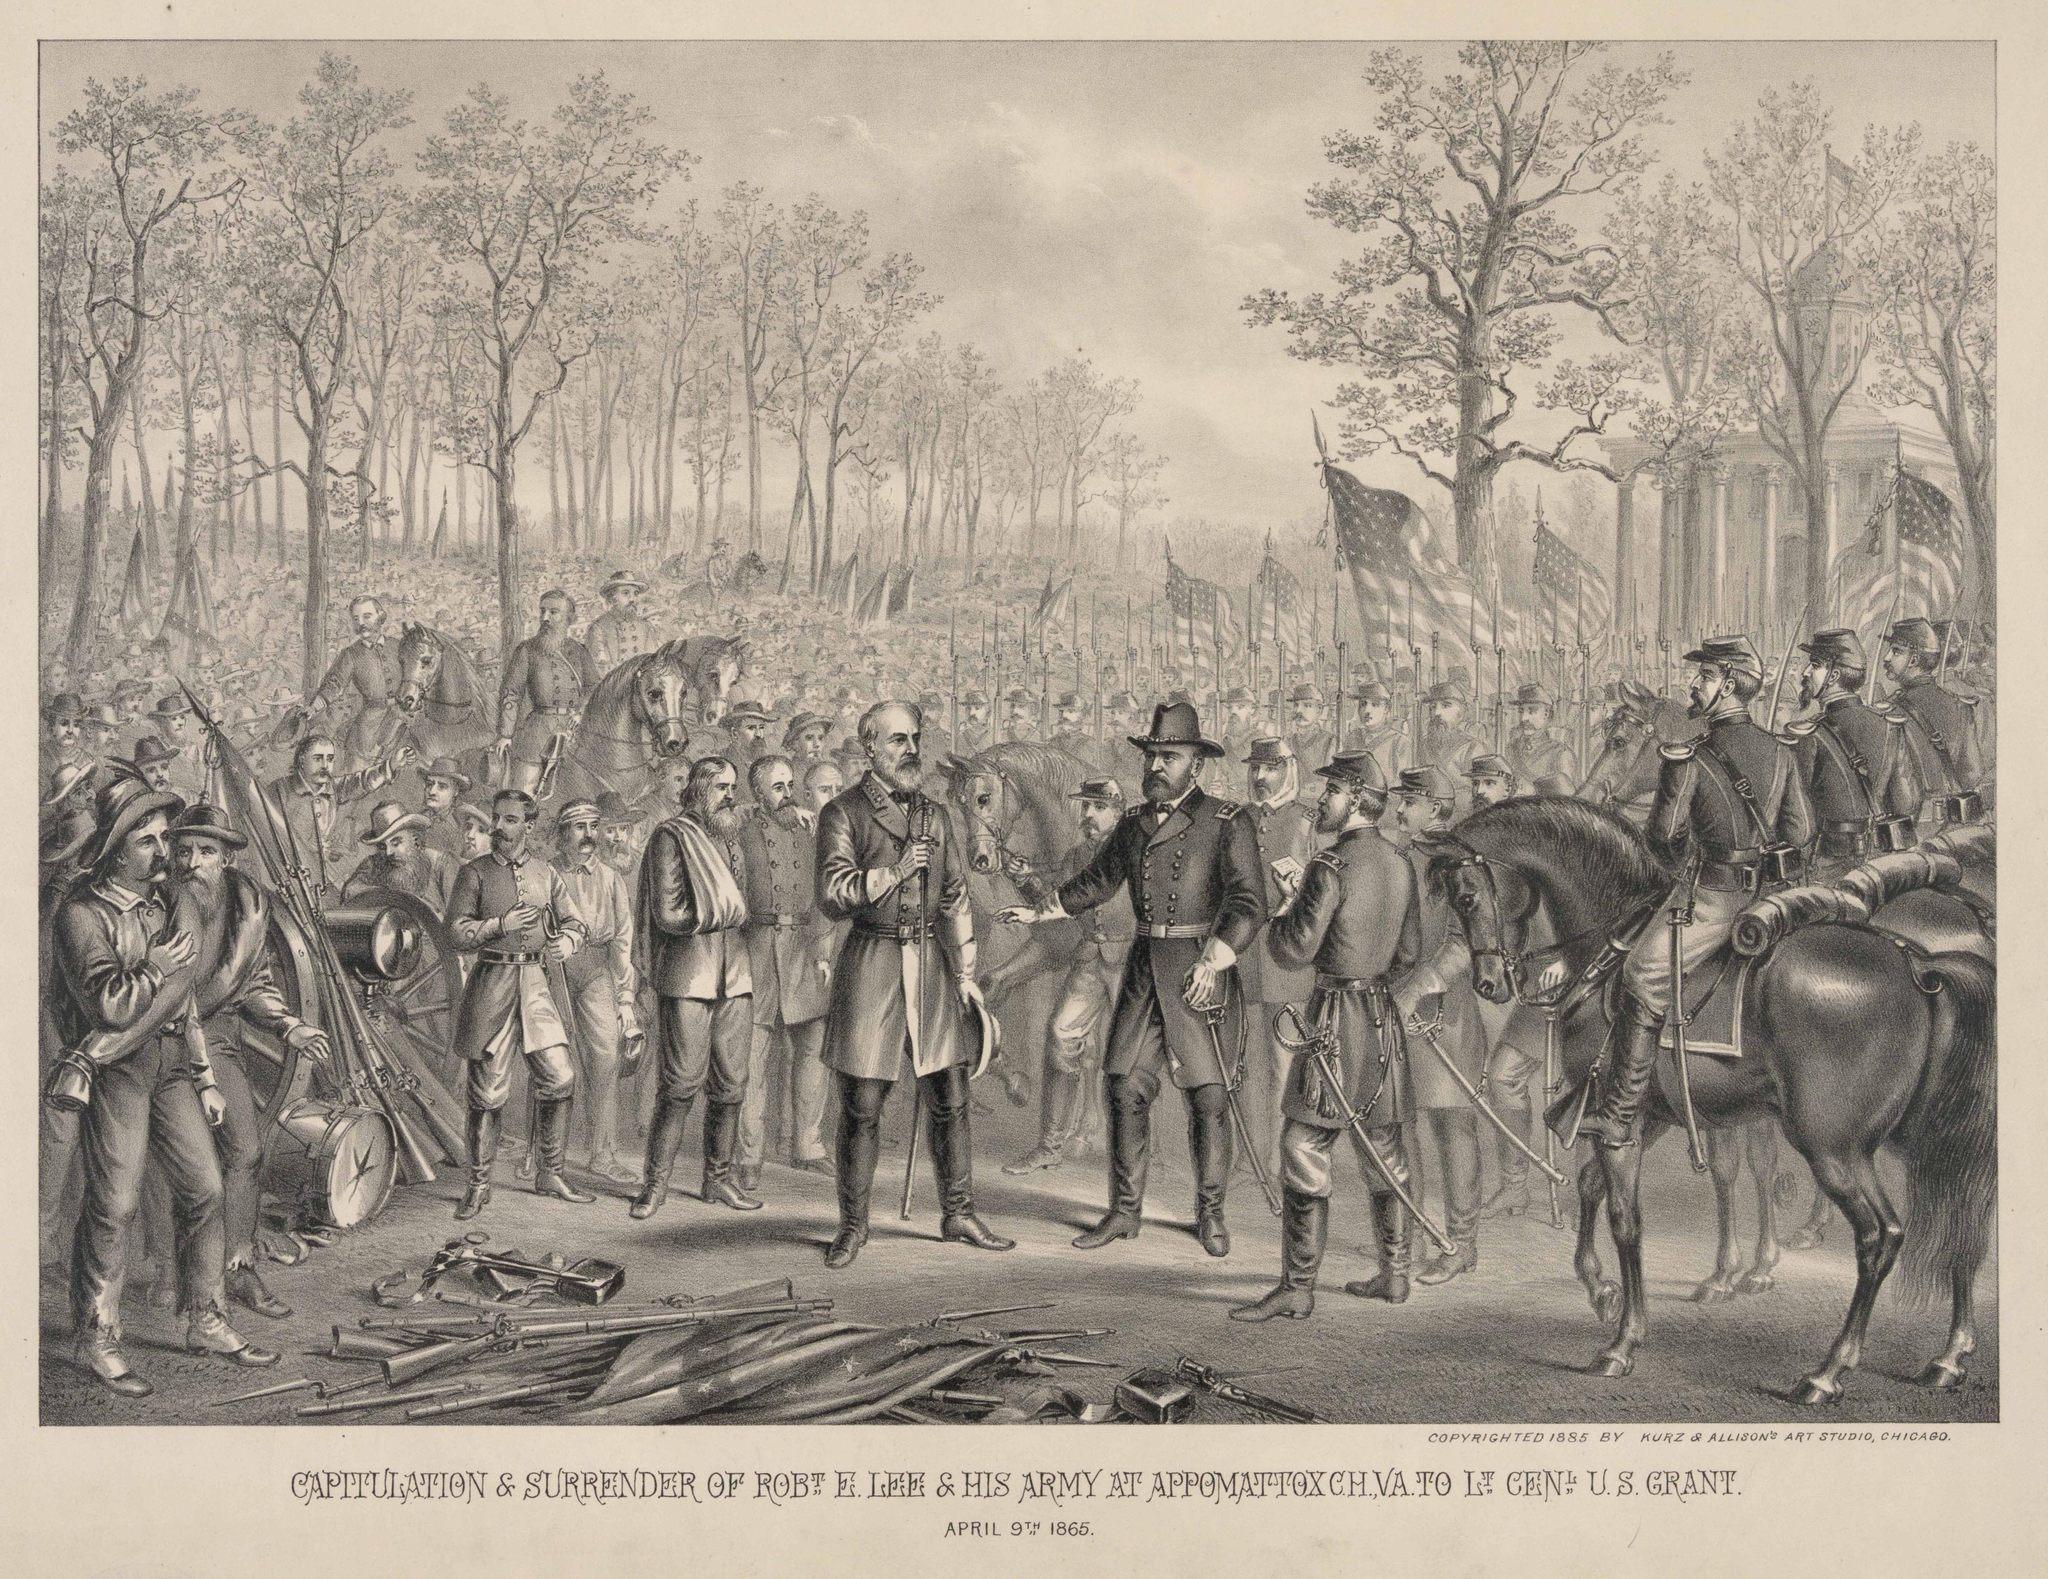 jeffersonian and jacksonian democracy